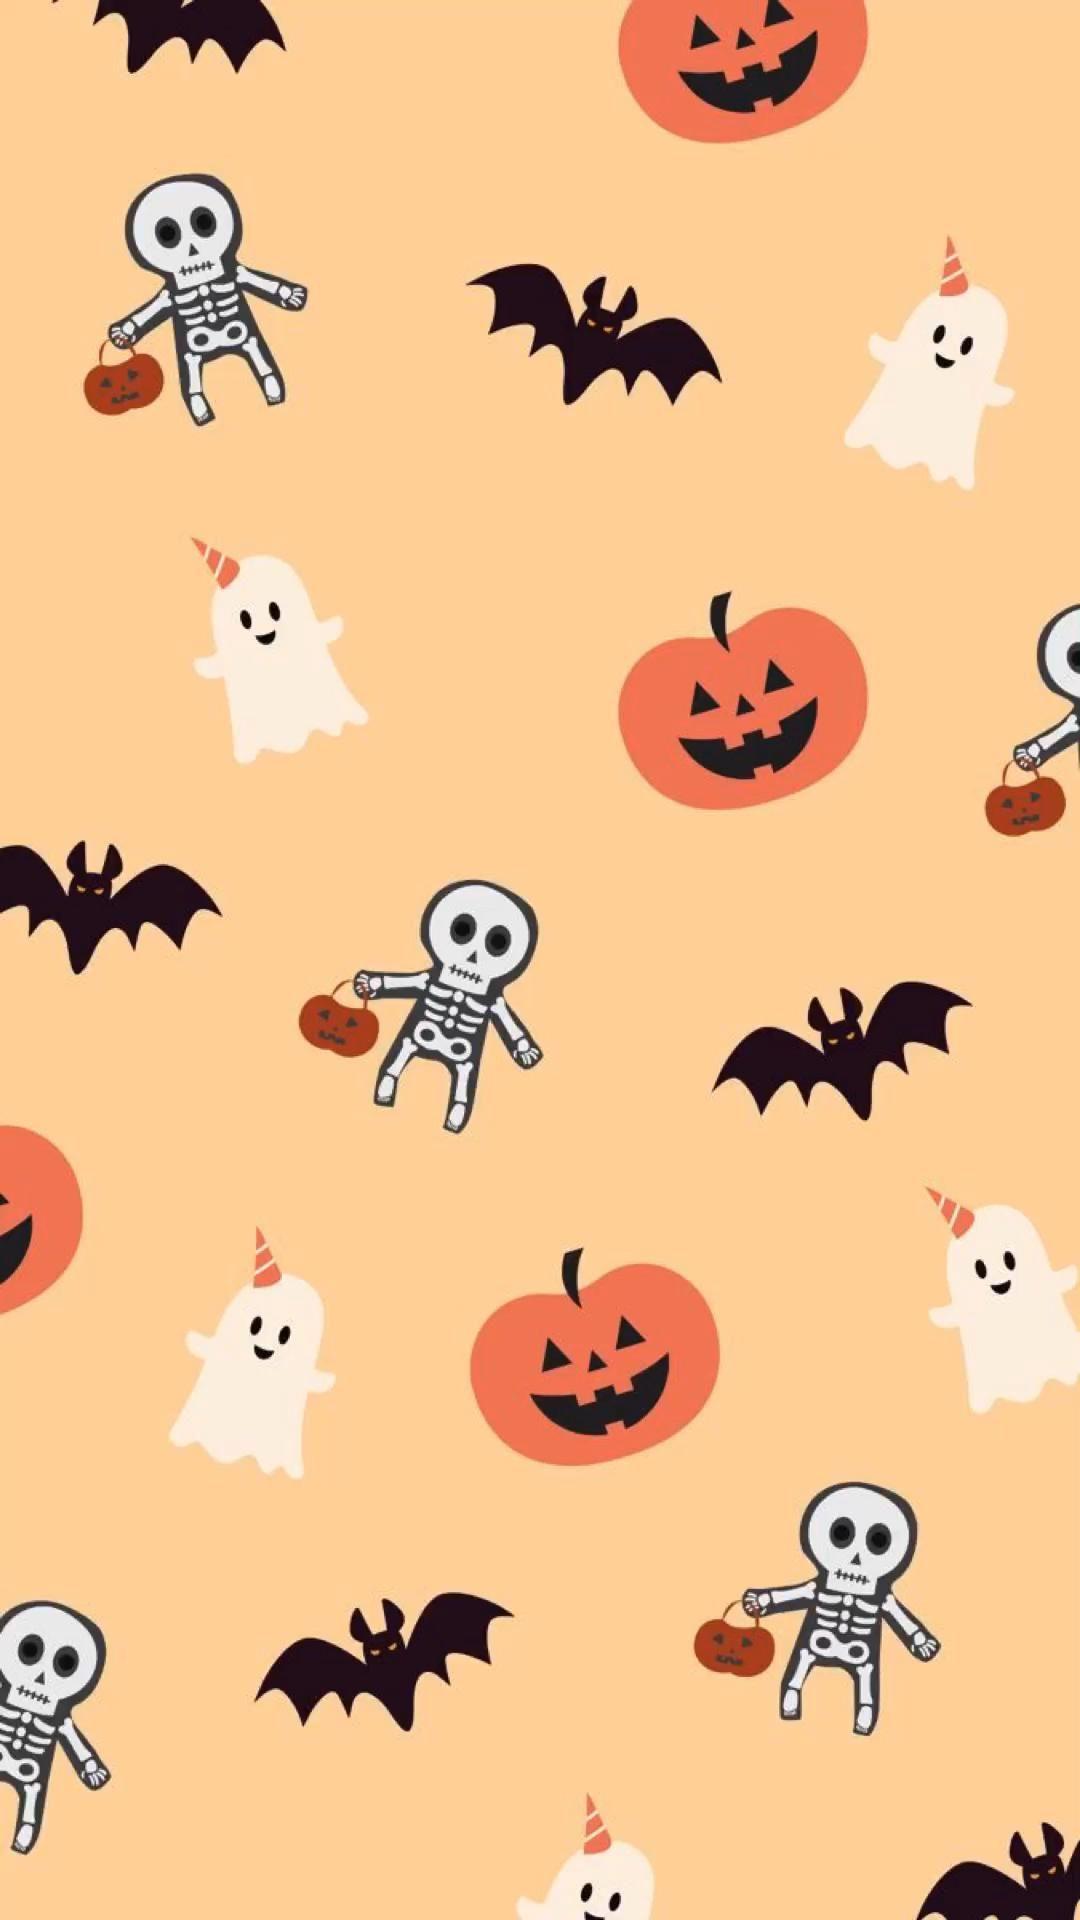 Cute fall/halloween wallpapers!🍁🎃💕